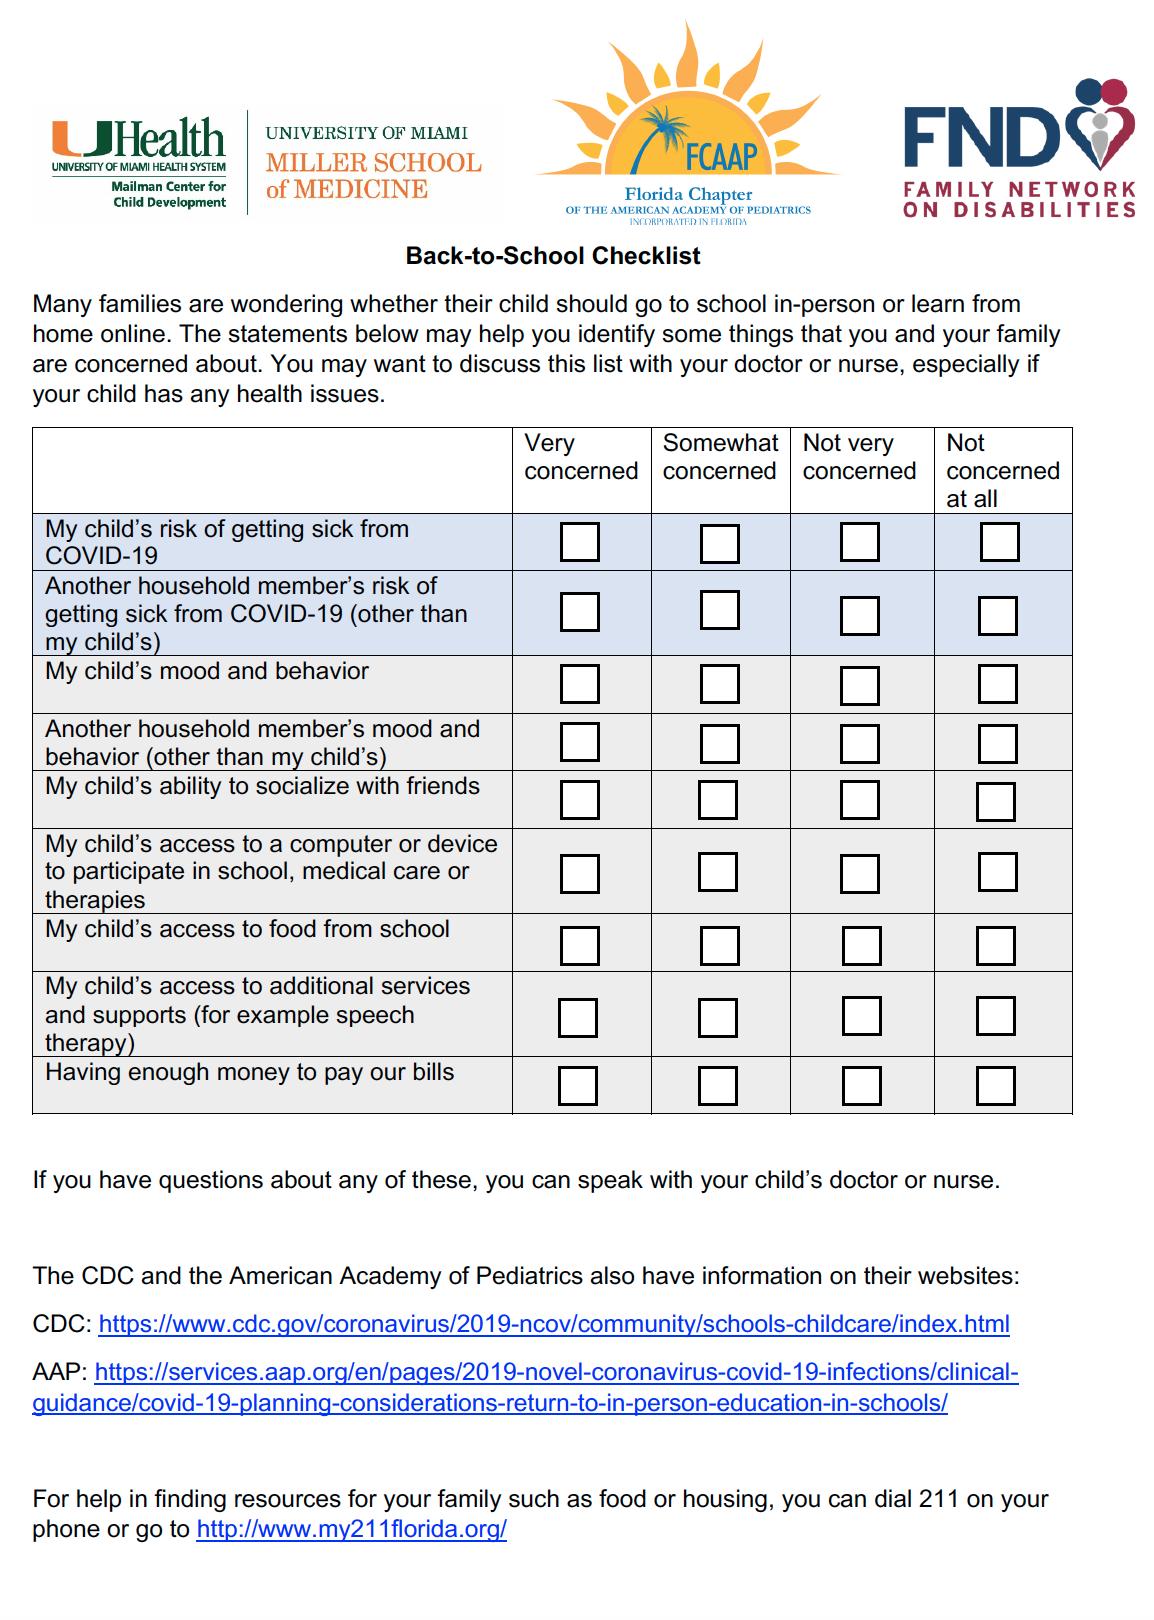 Back to School Checklist 2020